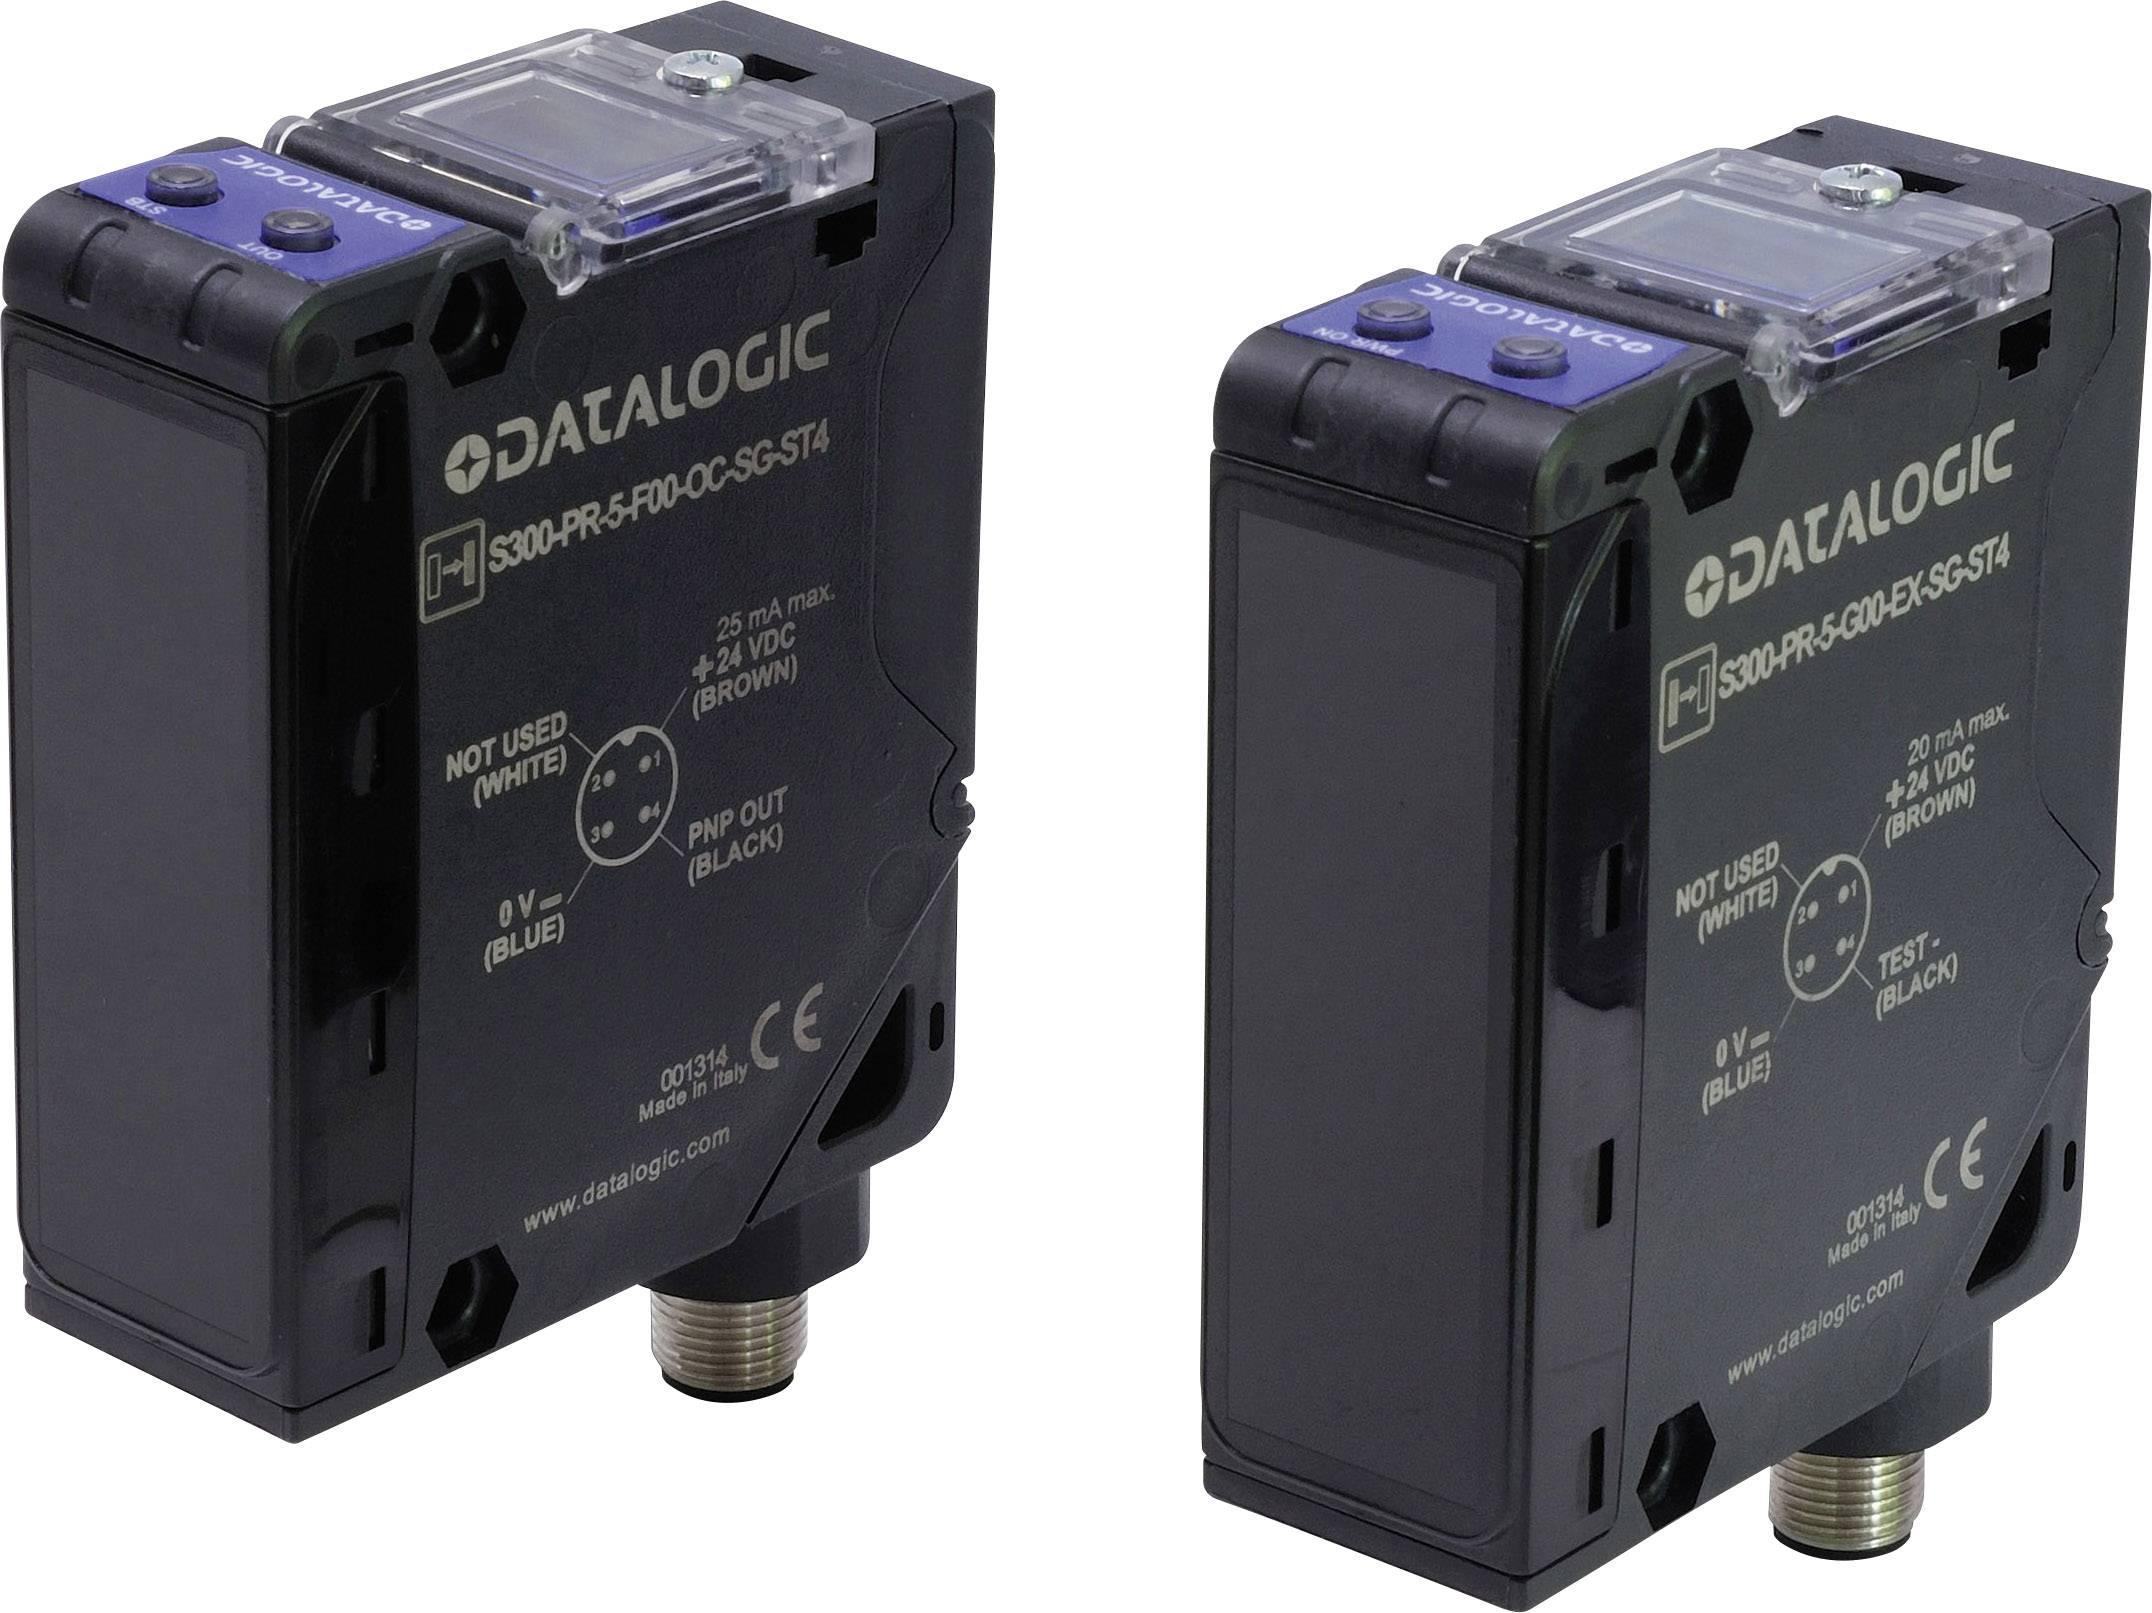 Reflexná svetelná závora DataLogic S300-PR-1-C01-RX 951451110, max. dosah 5 m